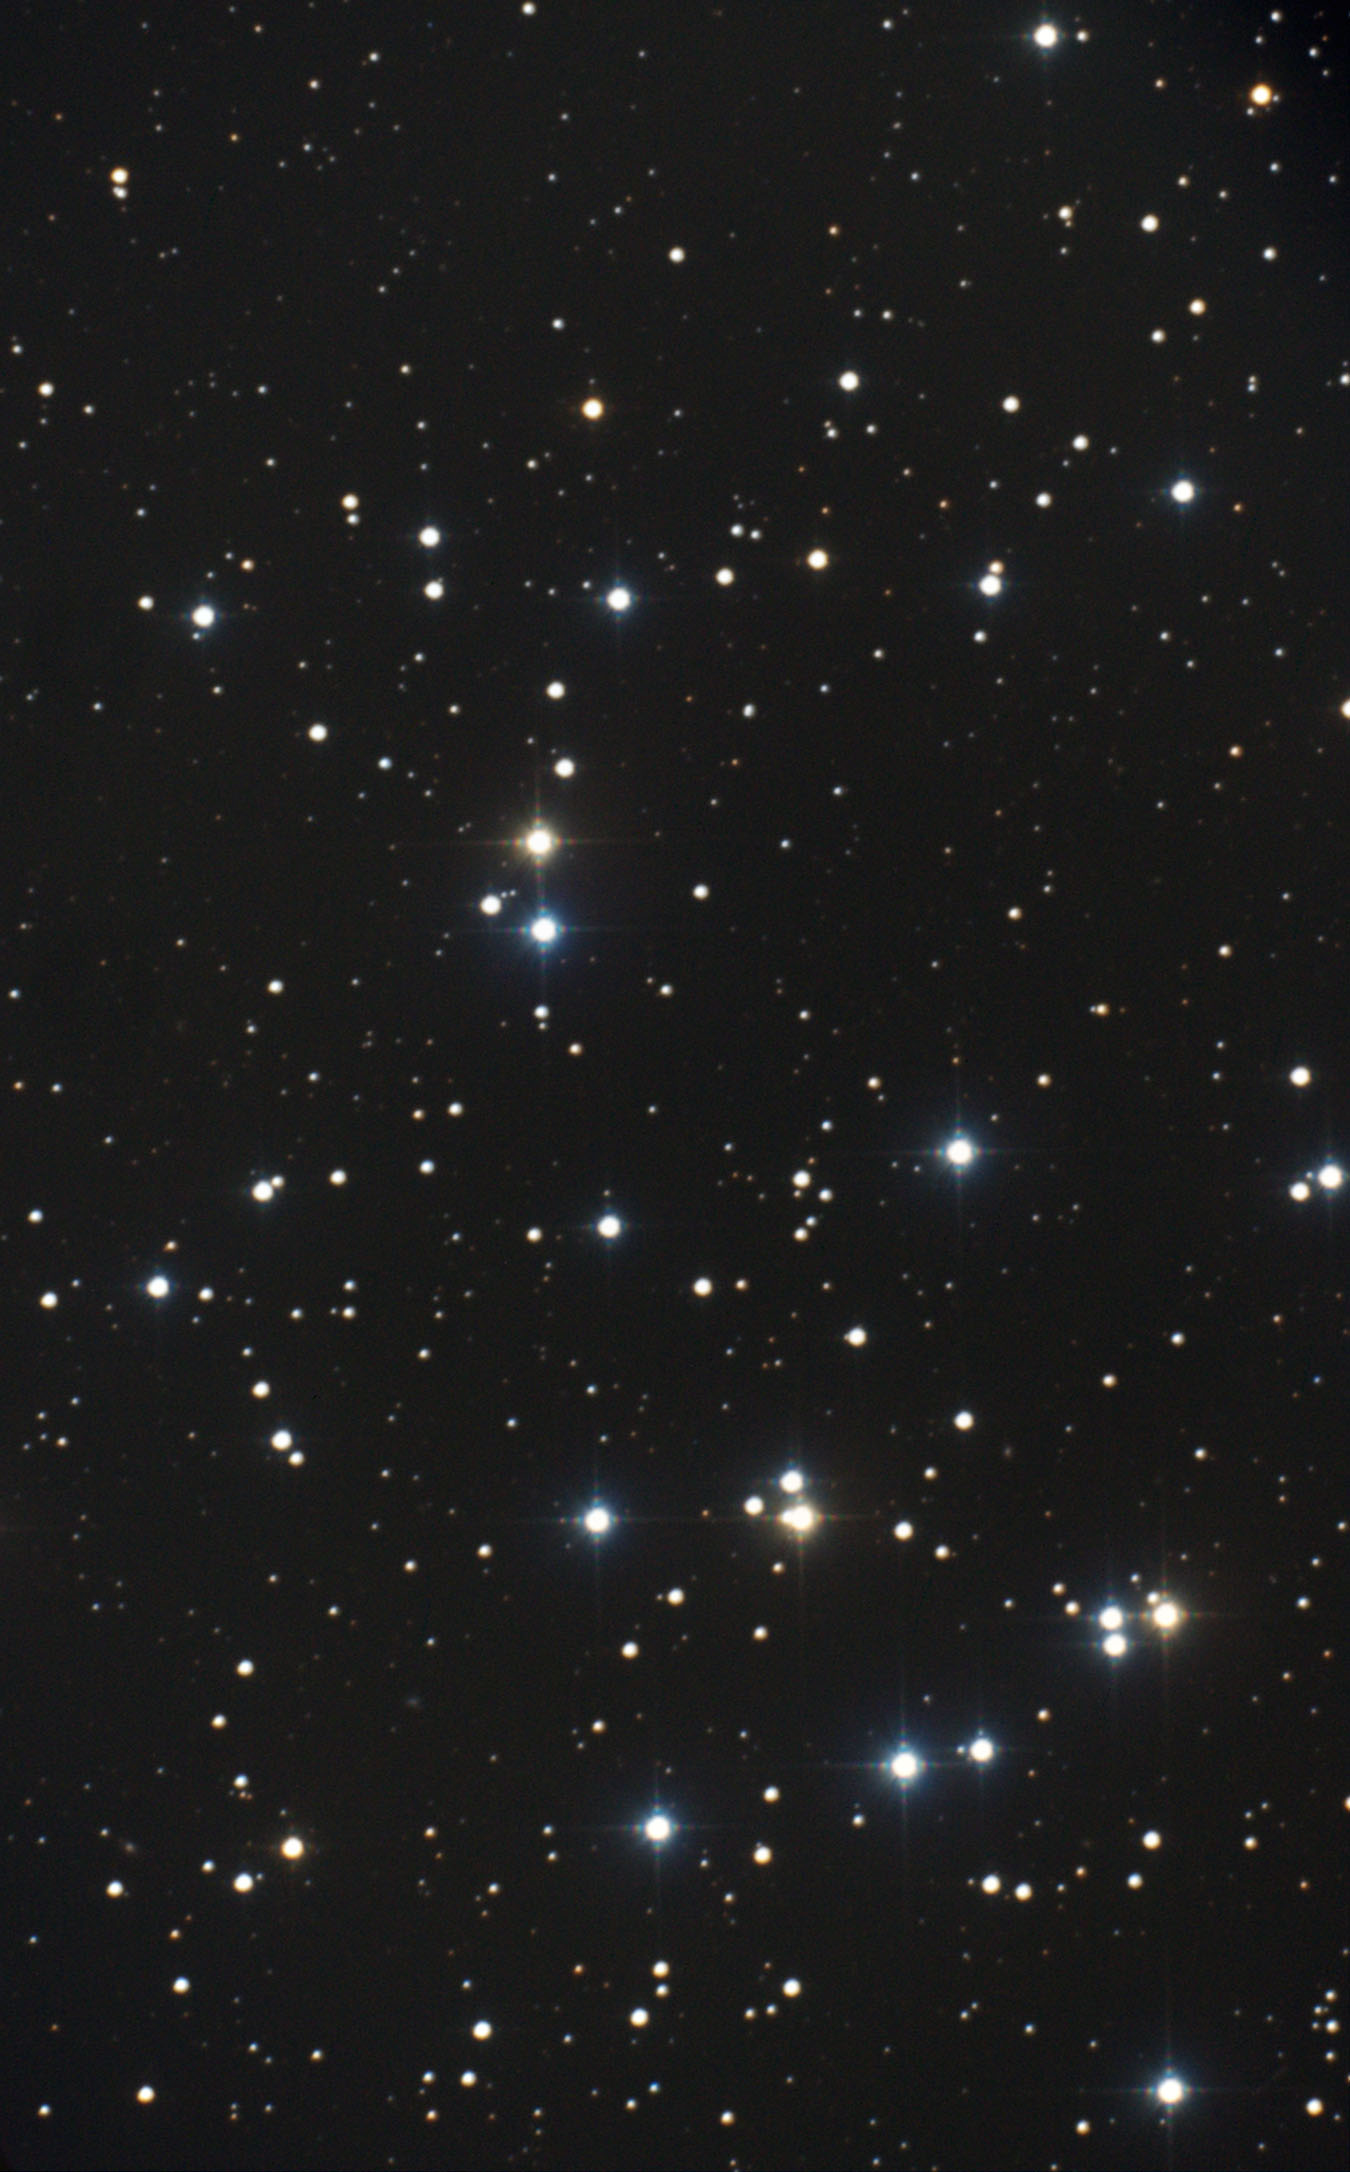 M44 - 02.09.2008